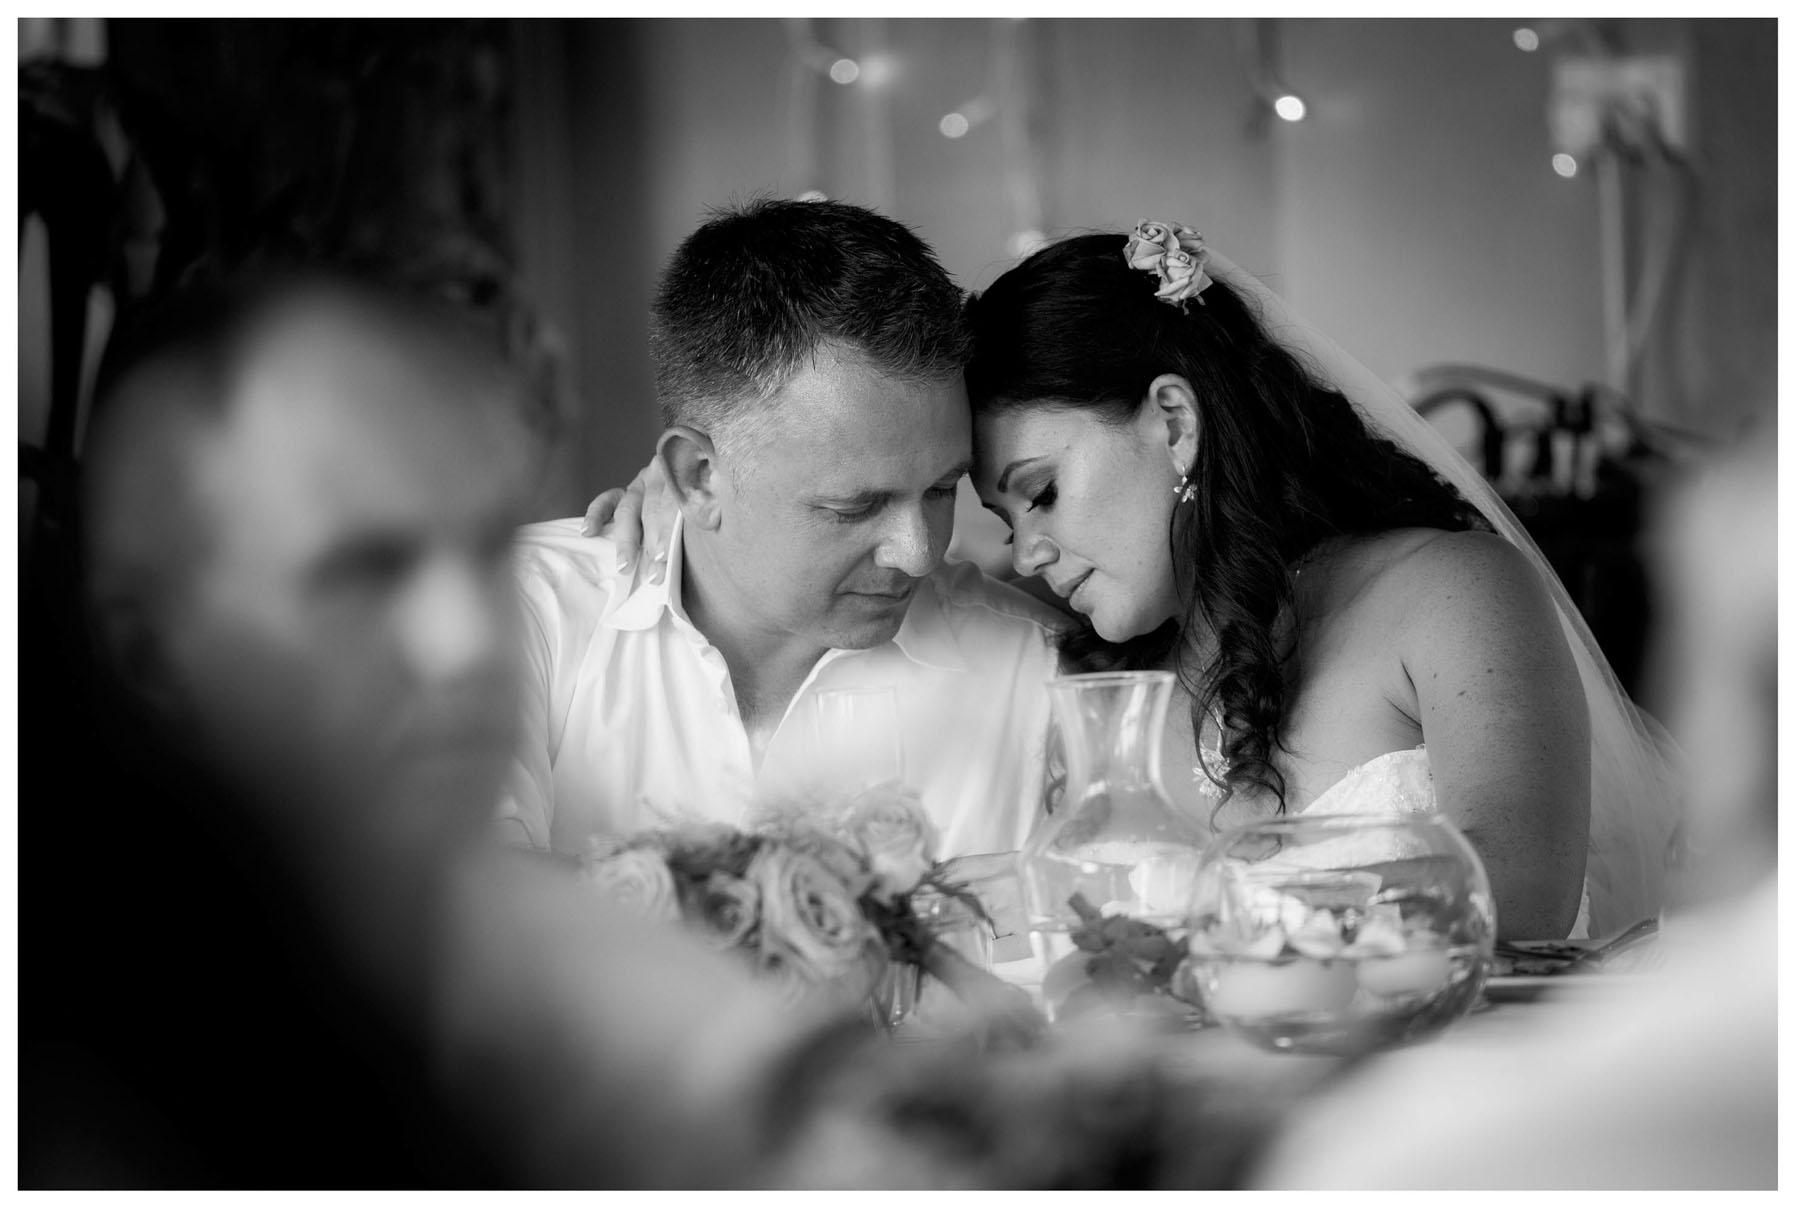 wedding photograph by Auckland wedding photographer Chris Loufte www.theweddingphotographer.co.nz Bethells Beach